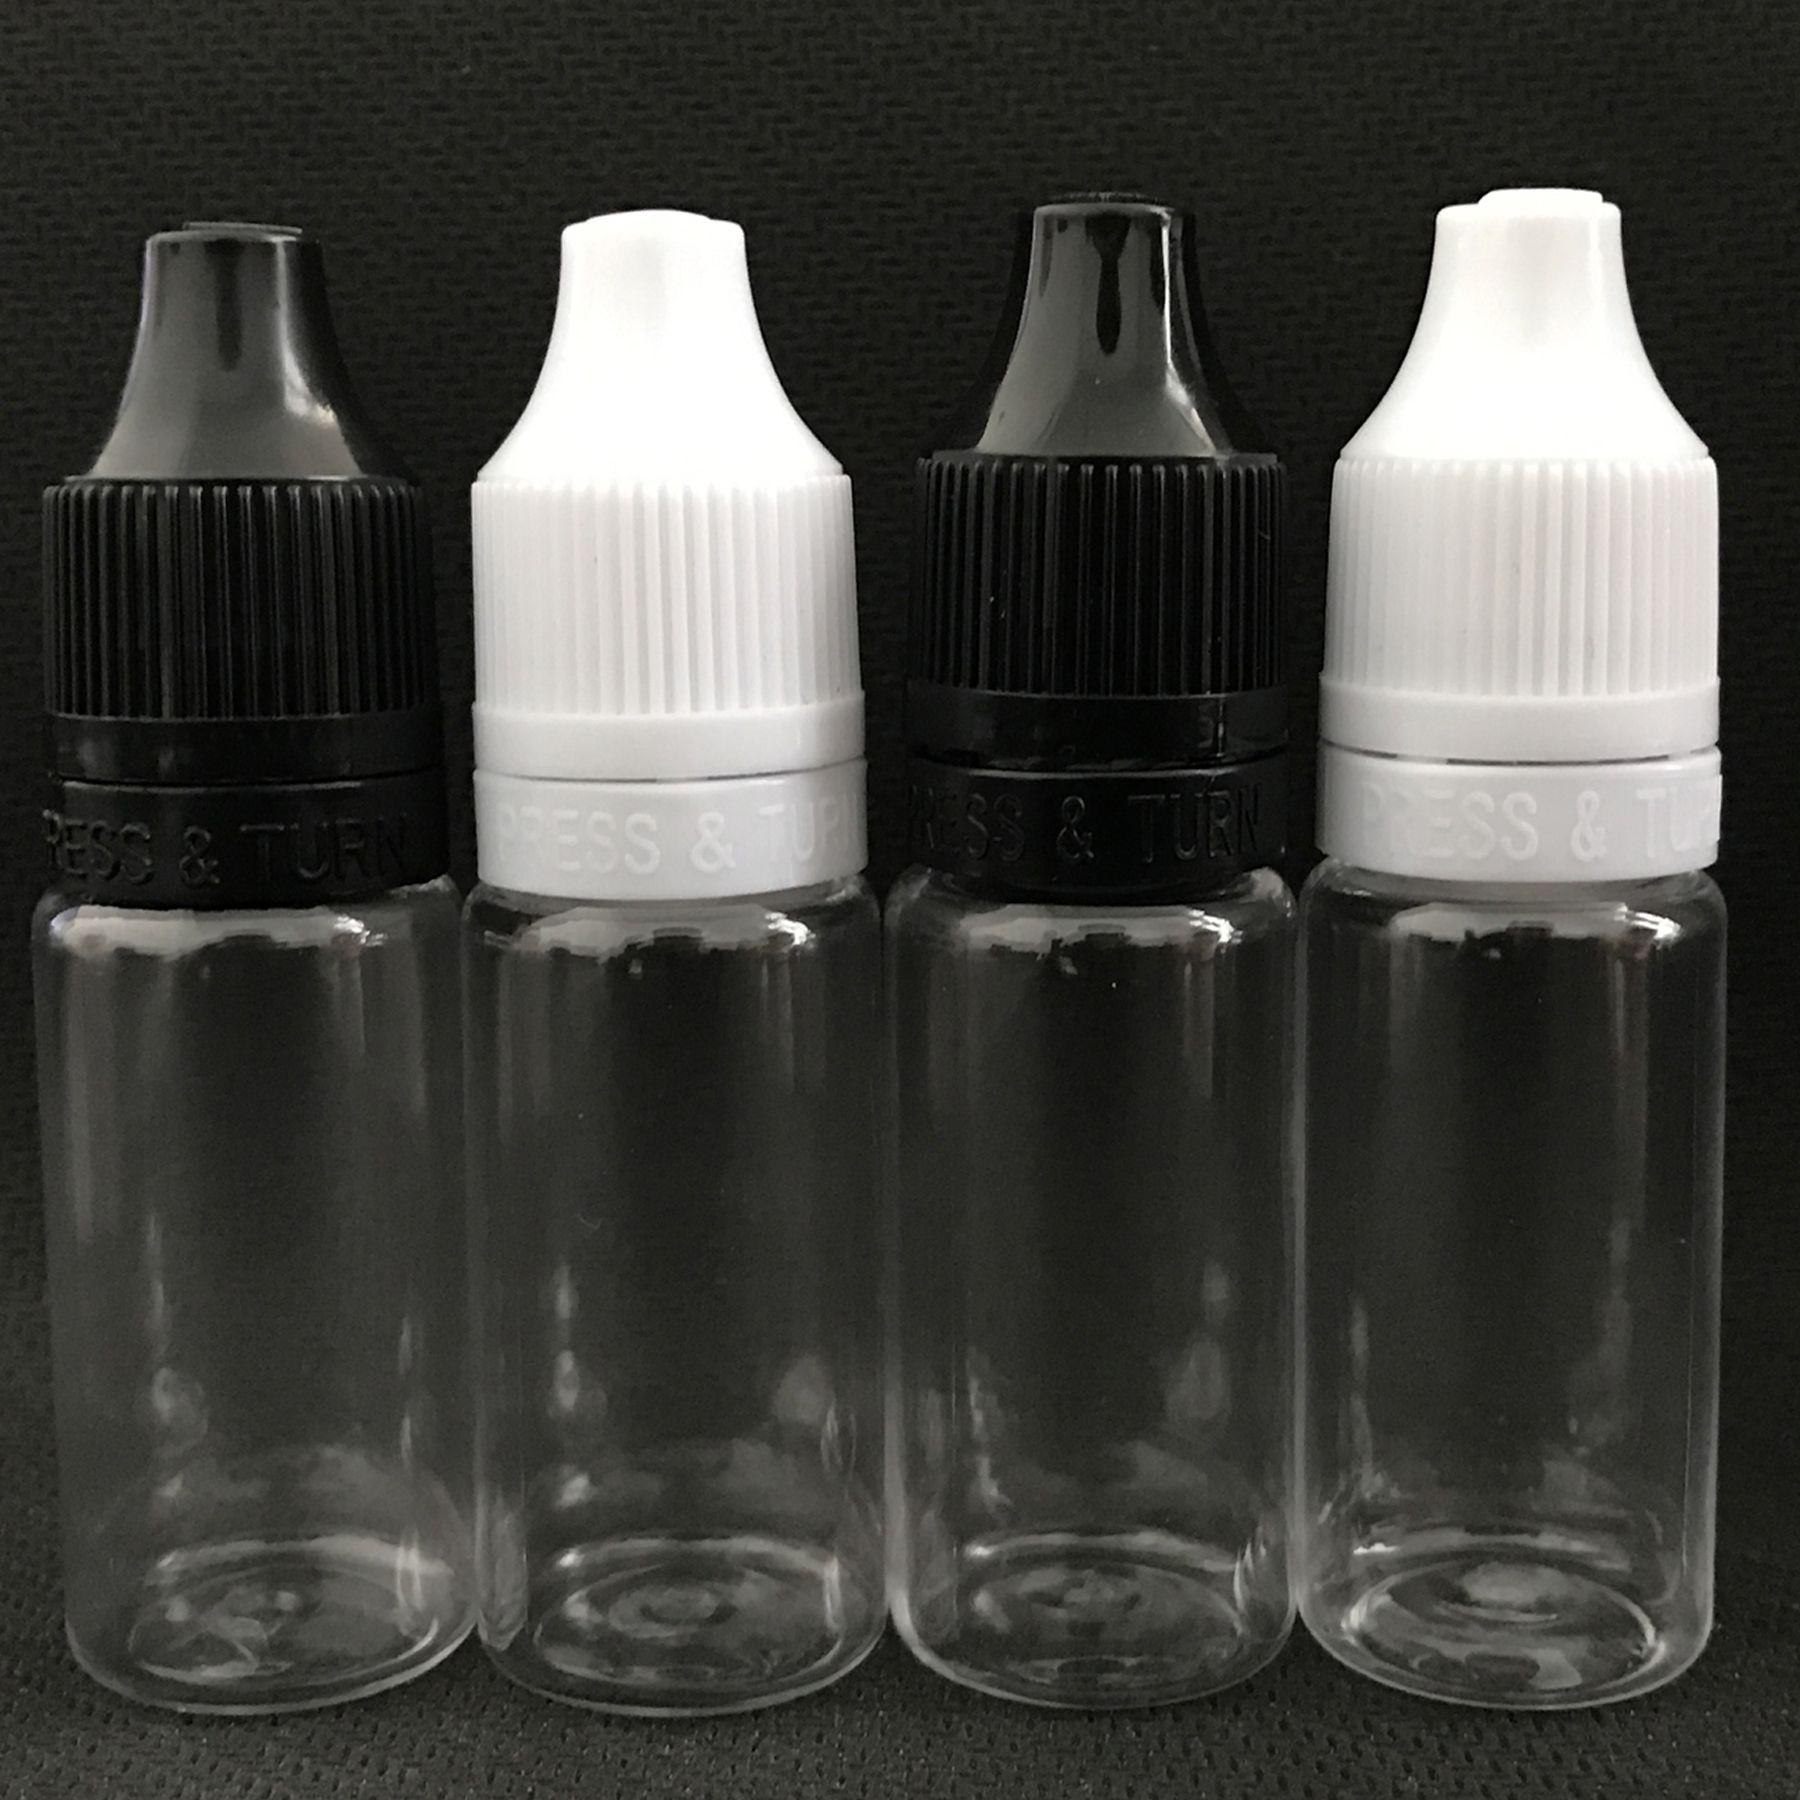 10ML 30ML PET زجاجة قطارة فارغة ل eliquid زجاجة vape شفافة للزجاجات eliquid مع PRESS TURN قبعات حريزعلى الأطفال DHL